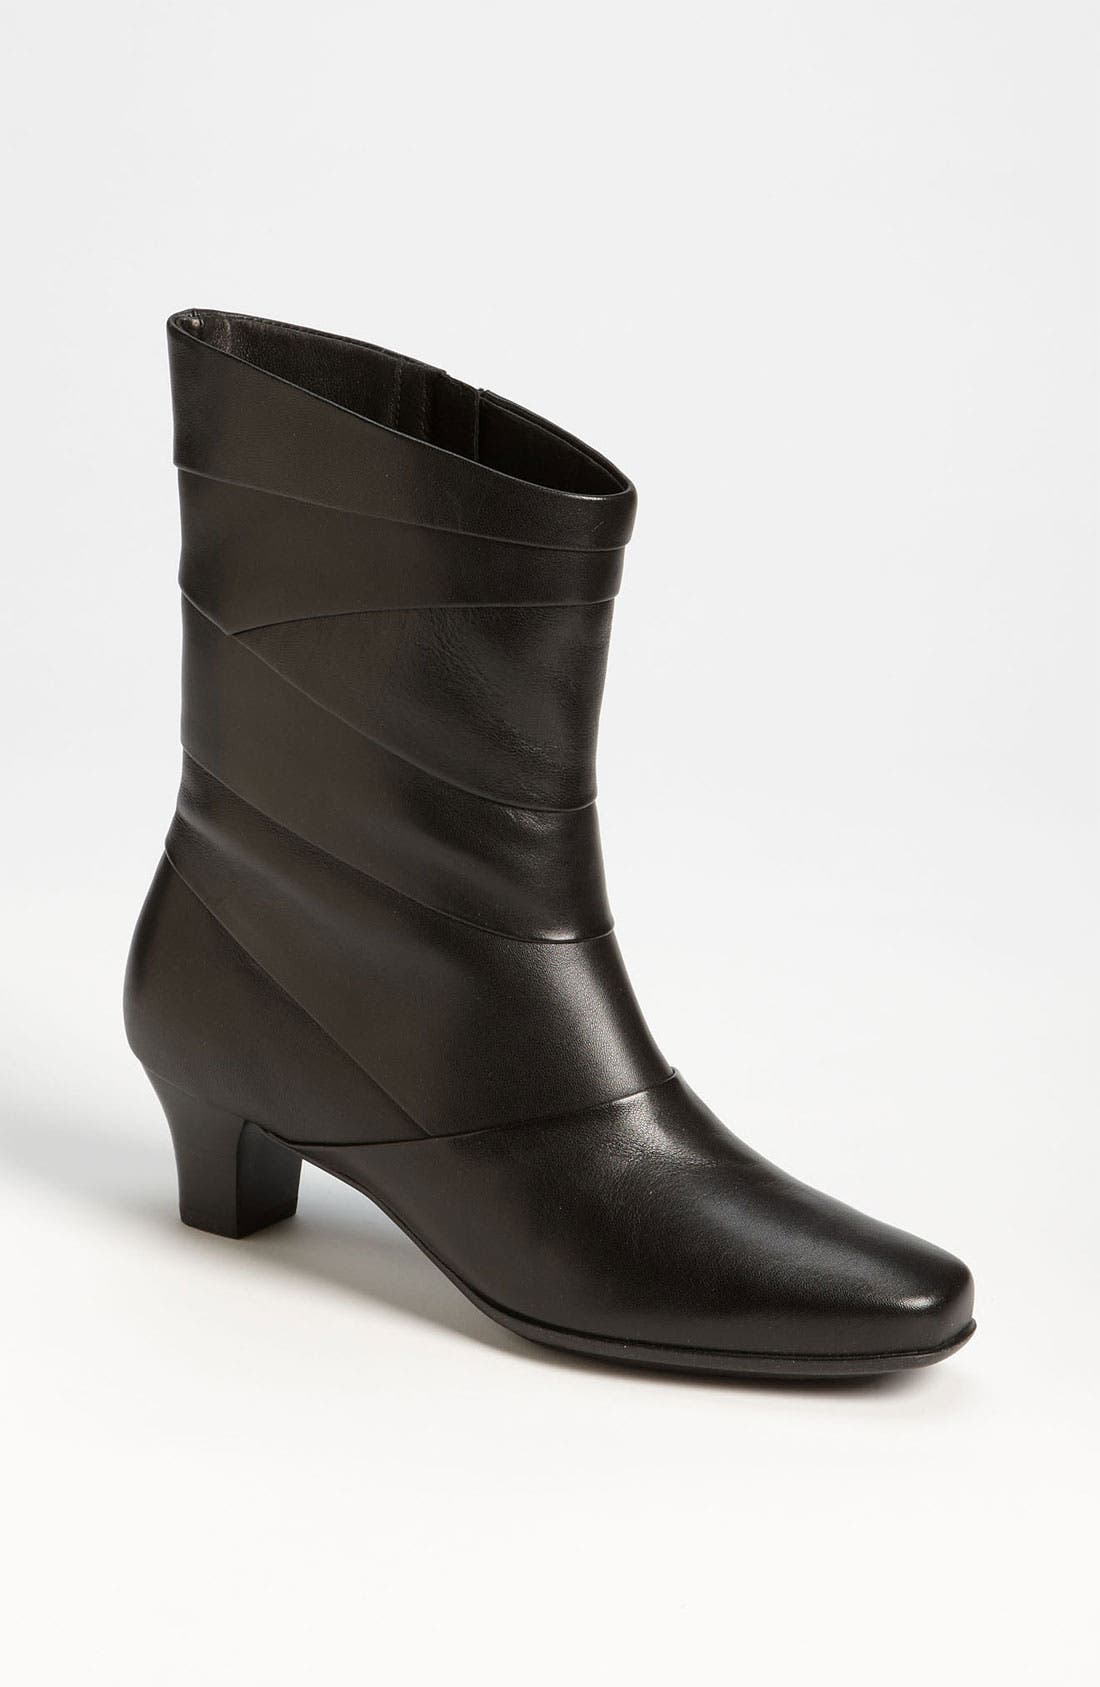 Main Image - Aravon 'Erica' Boot (Women)